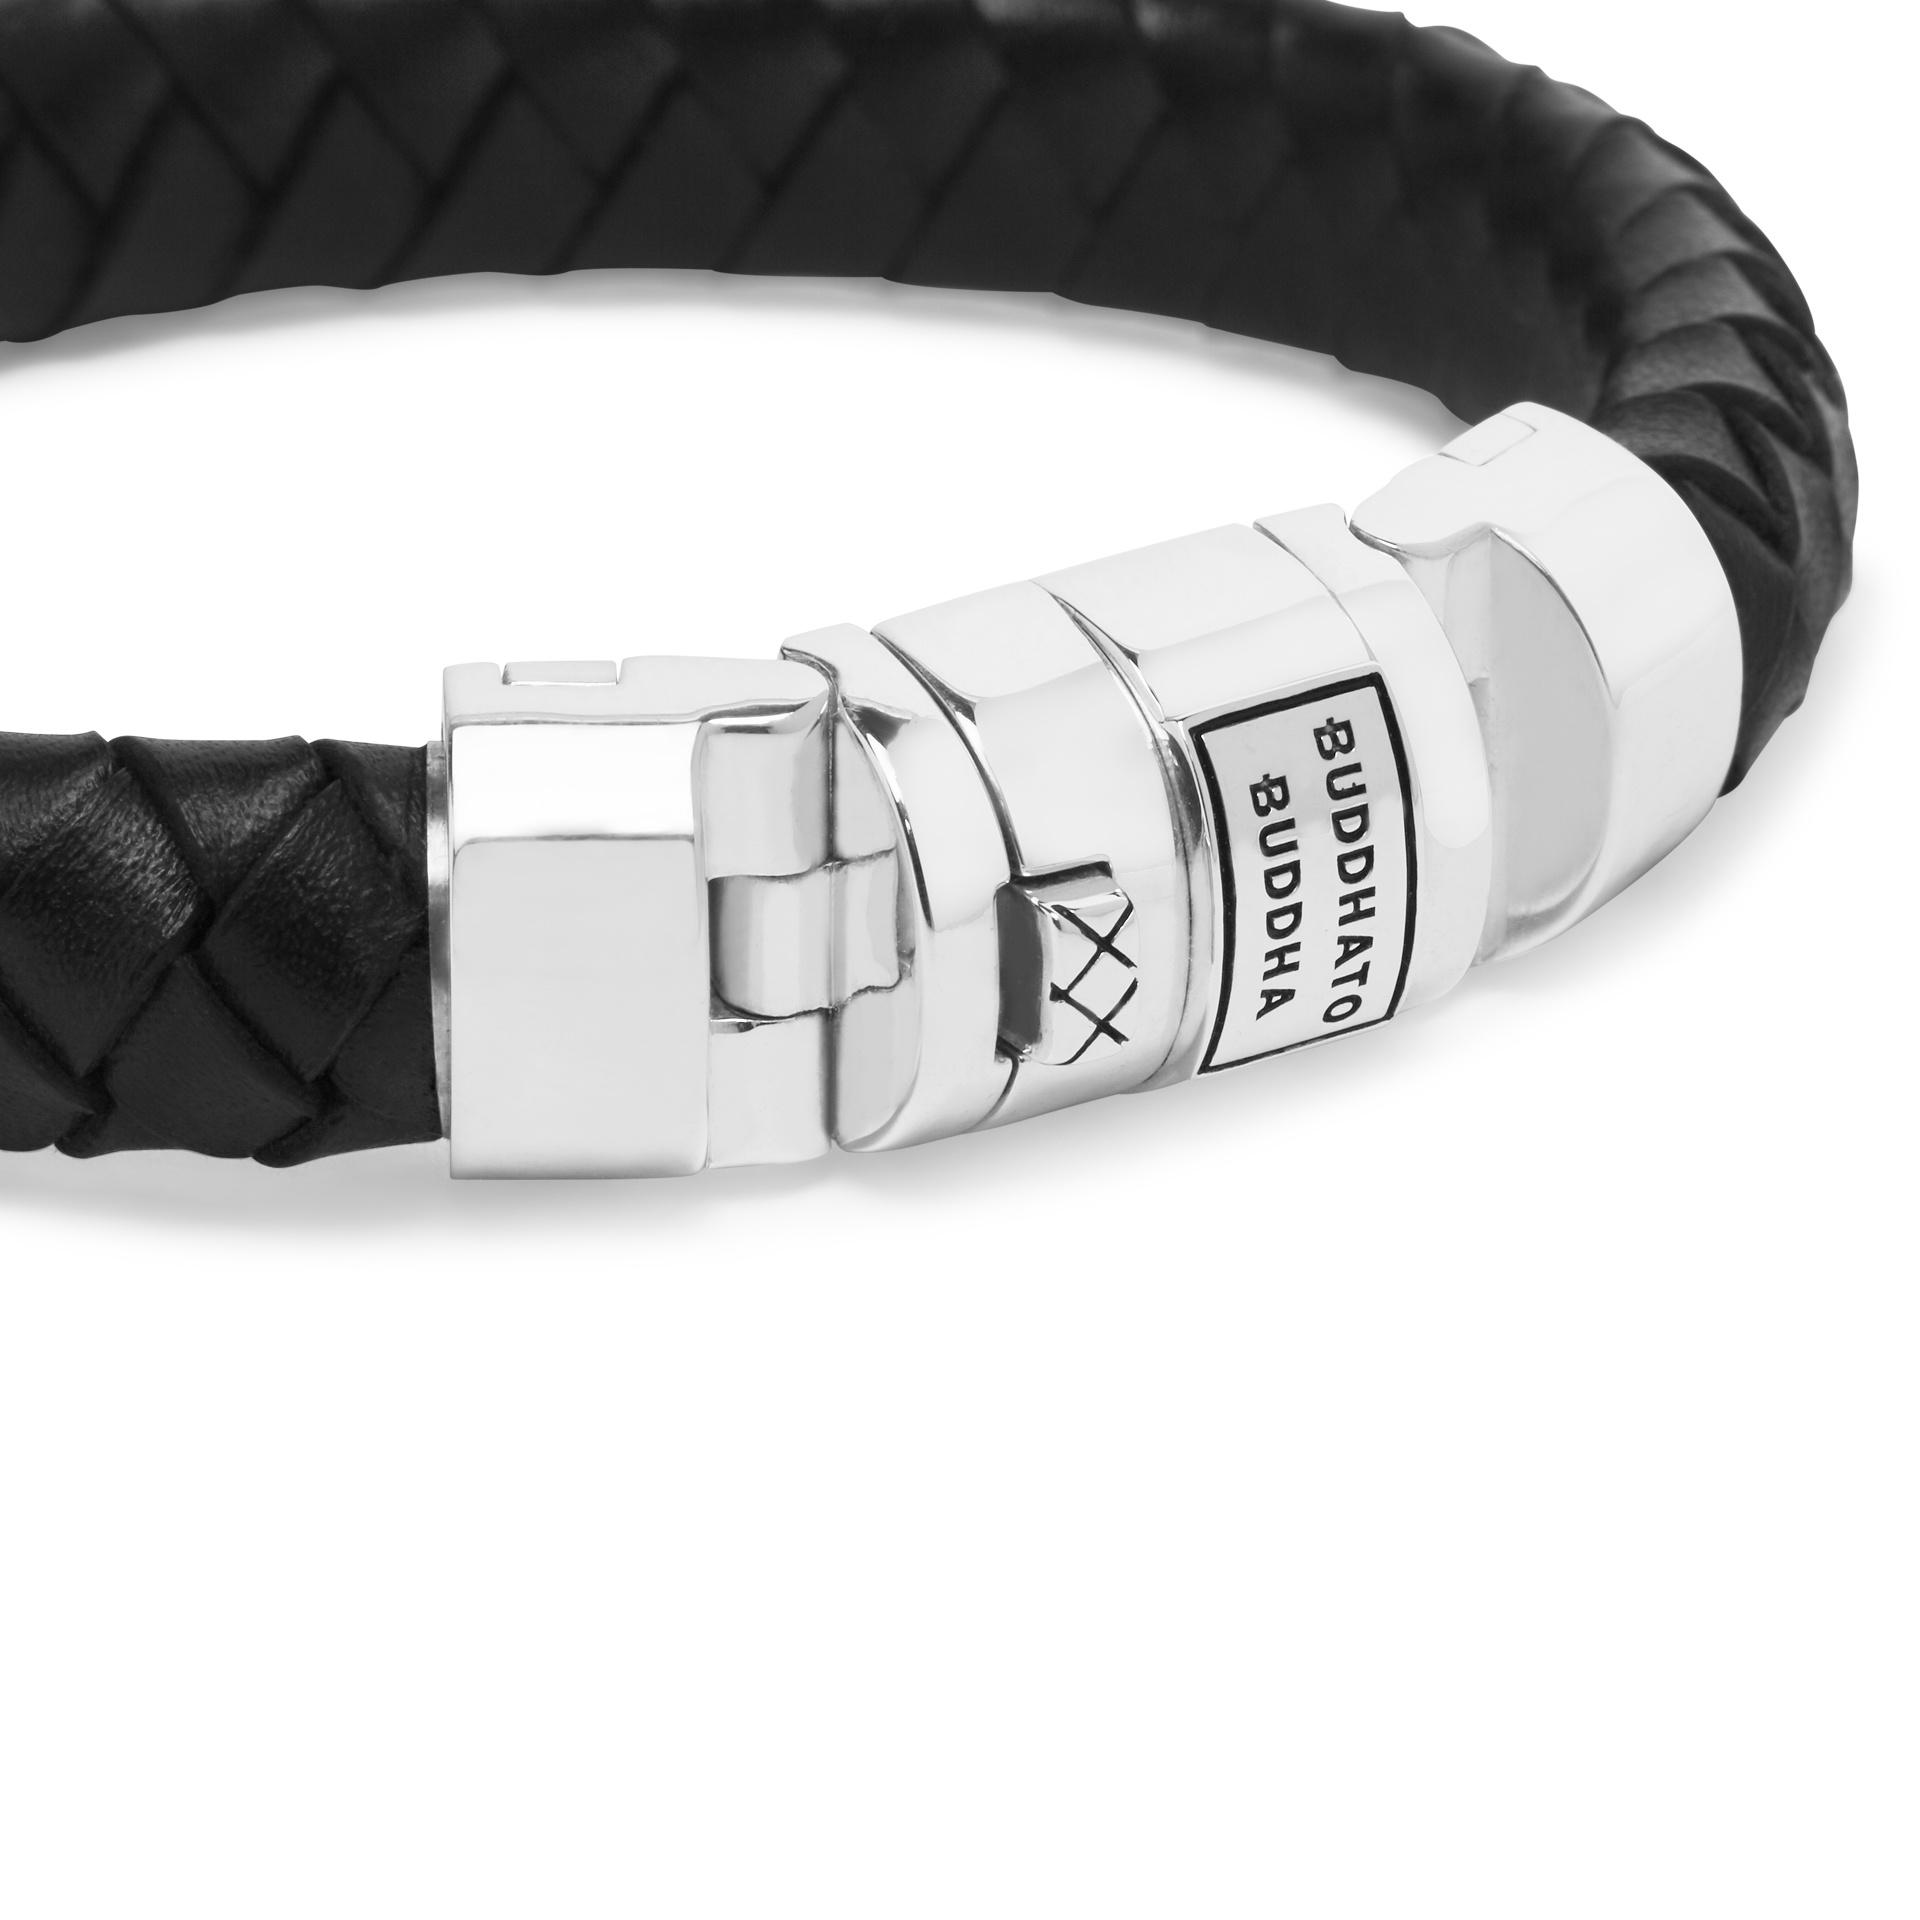 Bracelet Ben Customized Set Silver & Leather-3